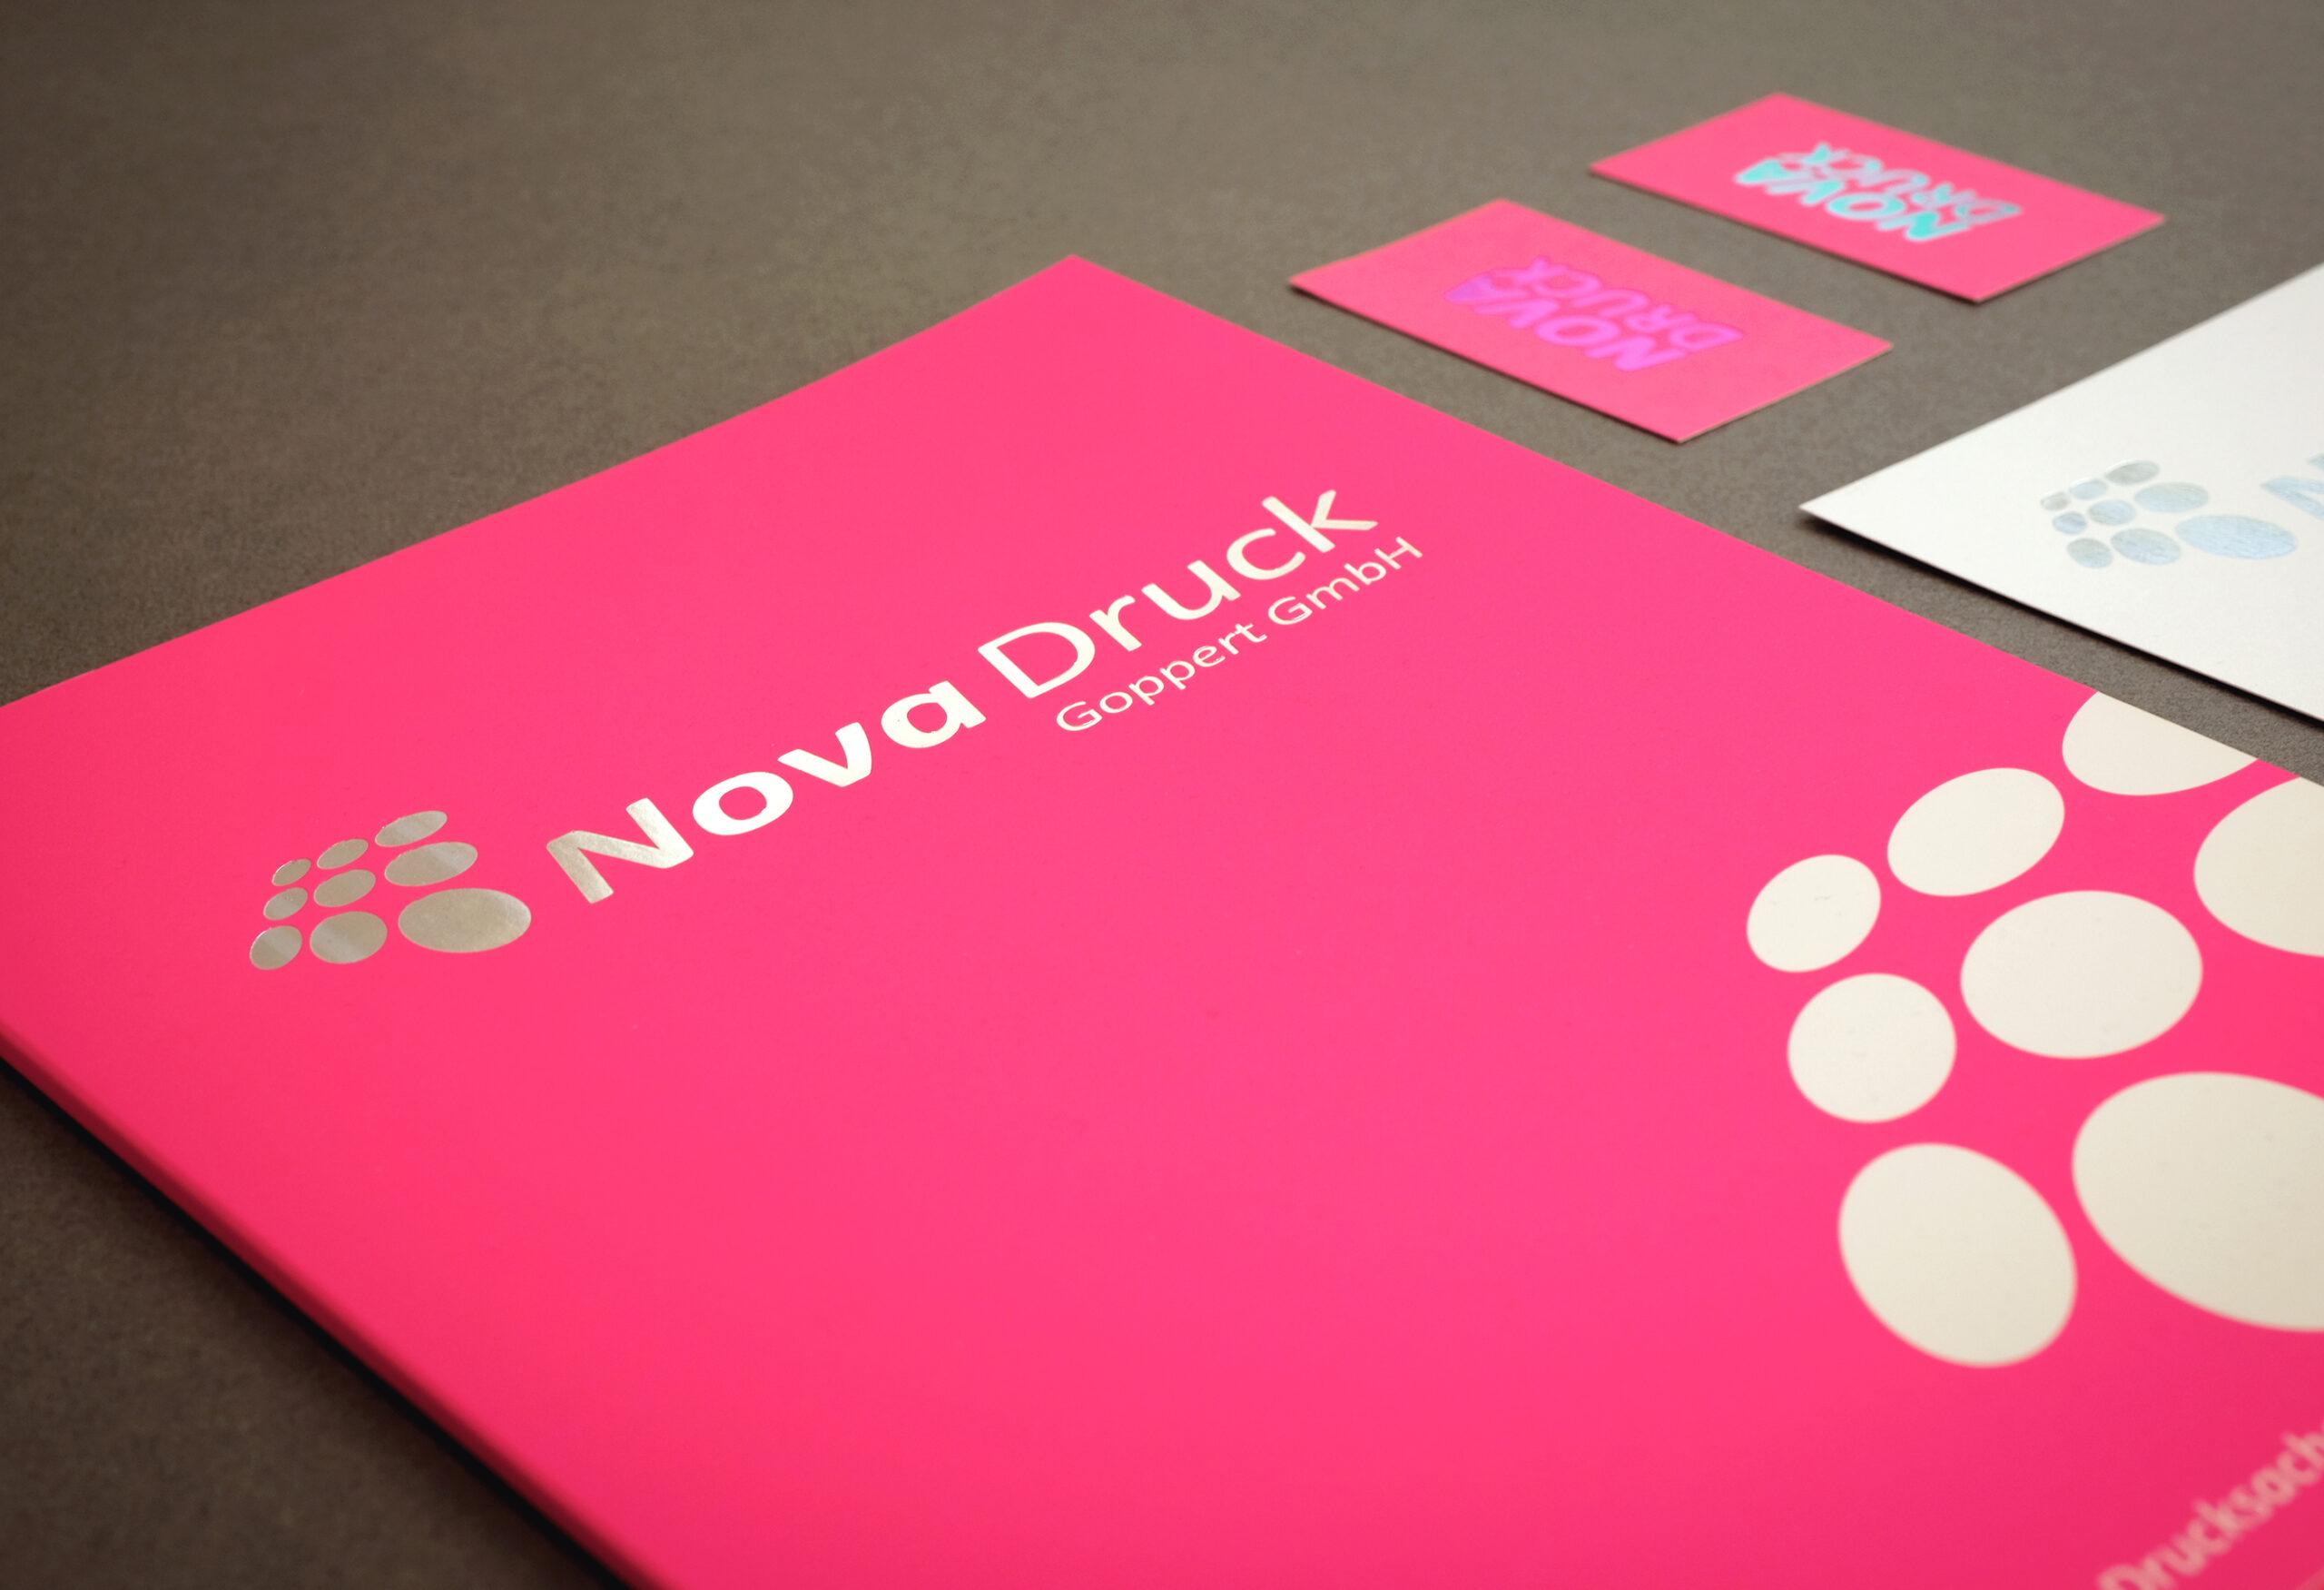 Nova Druck Bild Softtouch-Cellophanierung